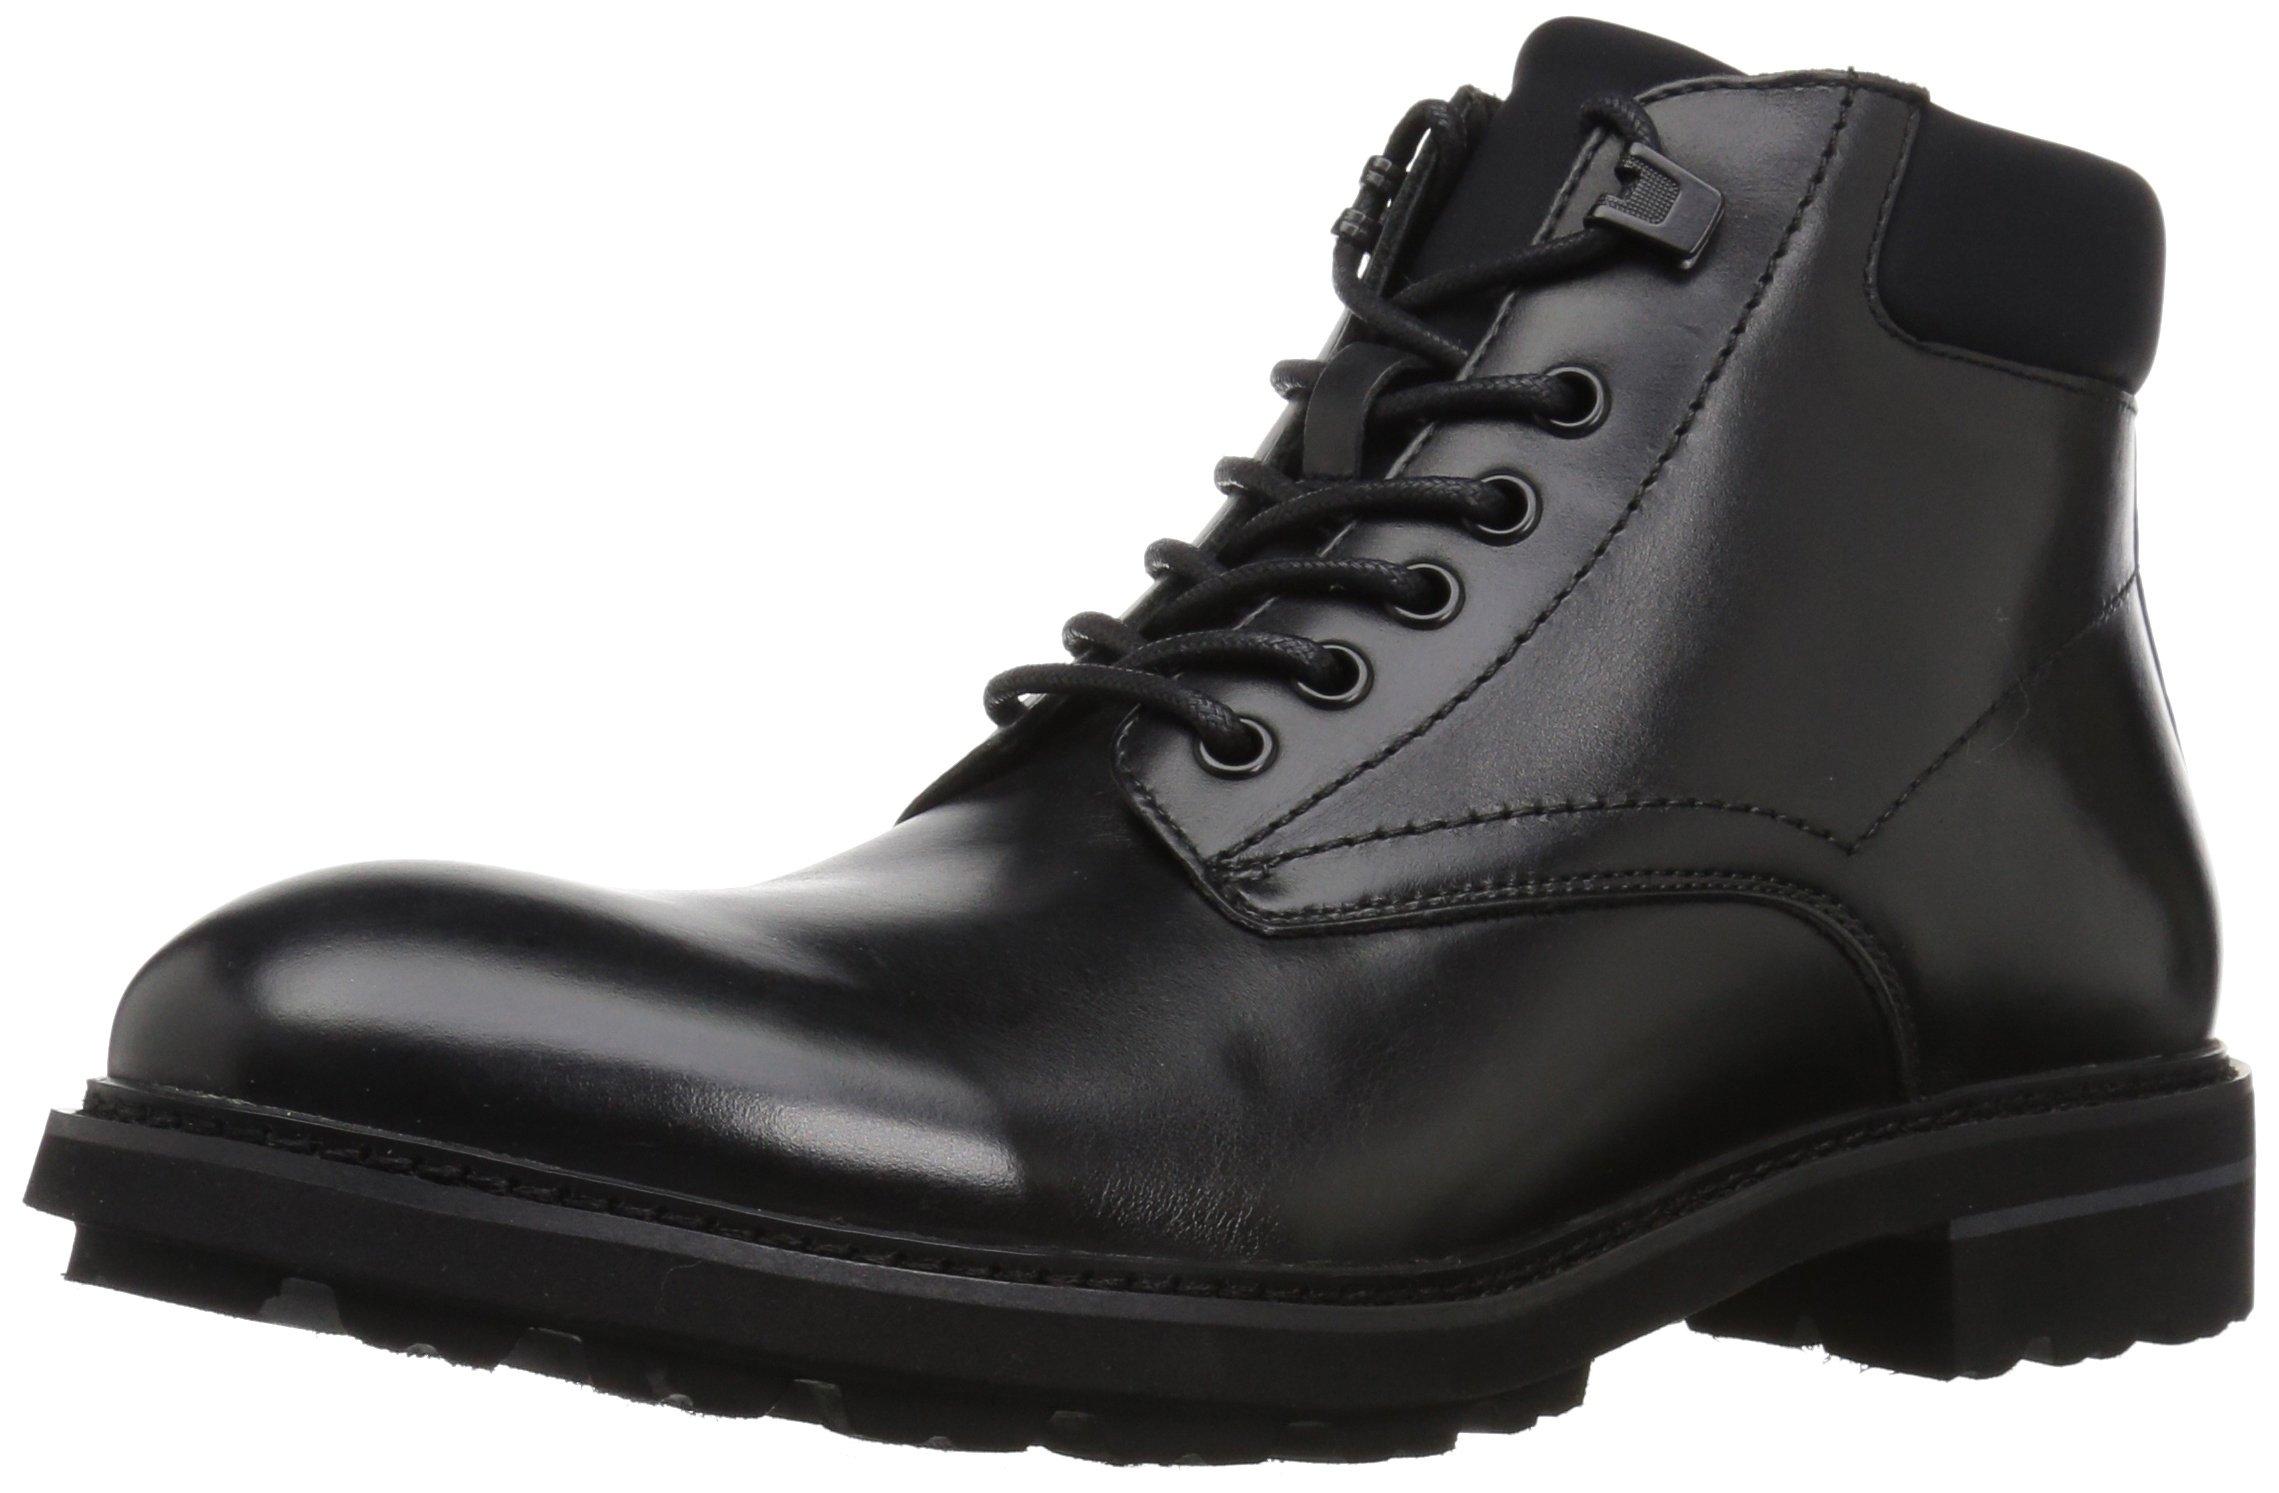 Kenneth Cole New York Men's Design 10445 Boot, Black, 9 M US